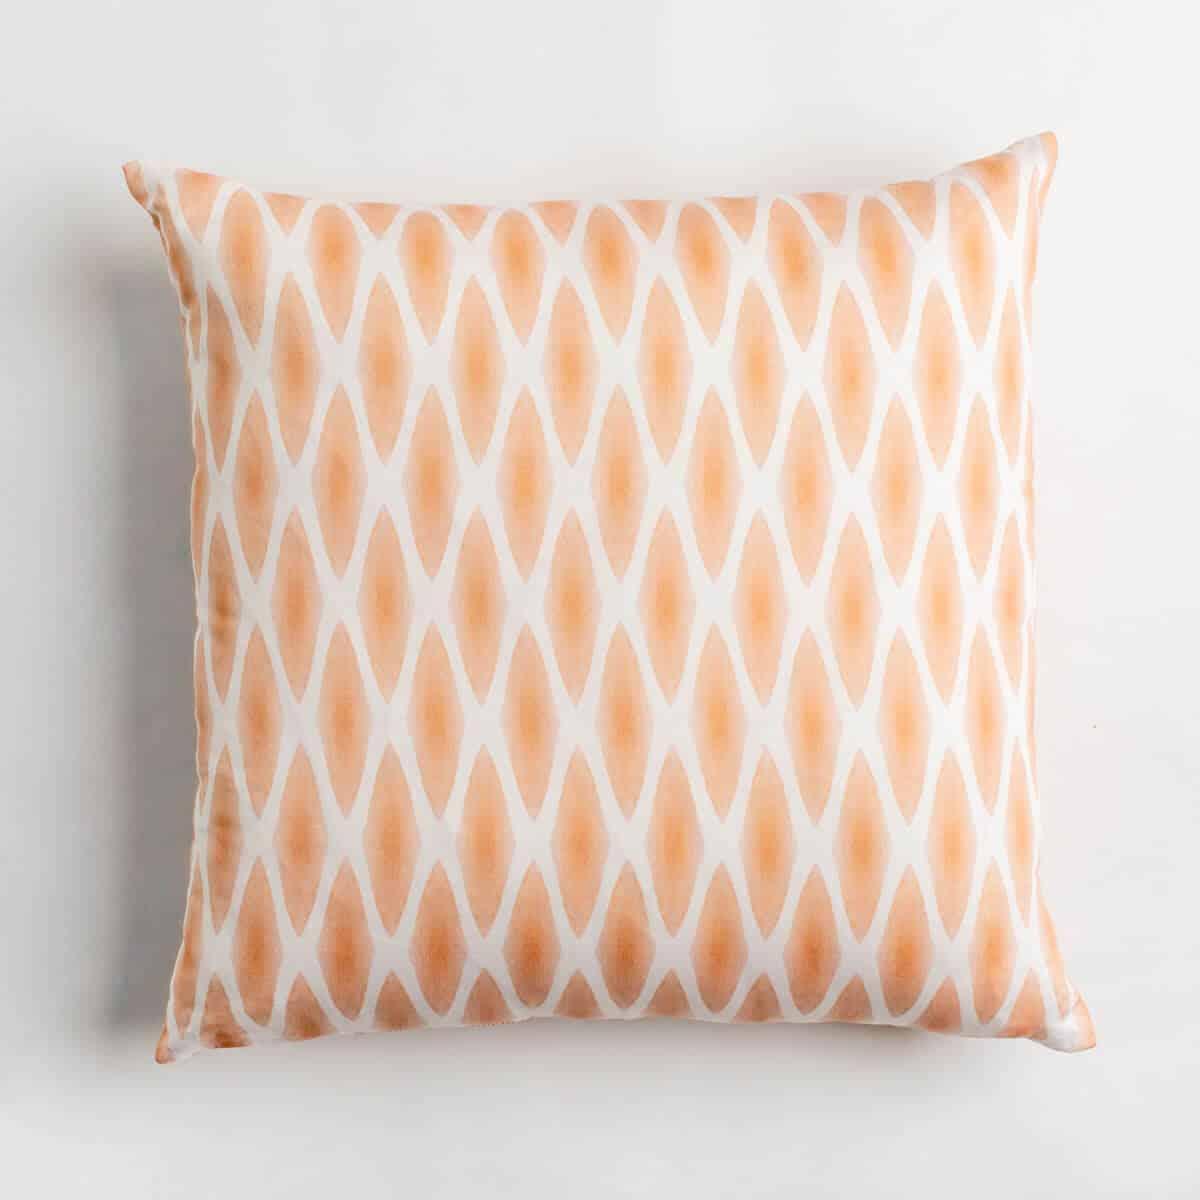 Admirable Soft Lattice Pillow In Rust Theyellowbook Wood Chair Design Ideas Theyellowbookinfo